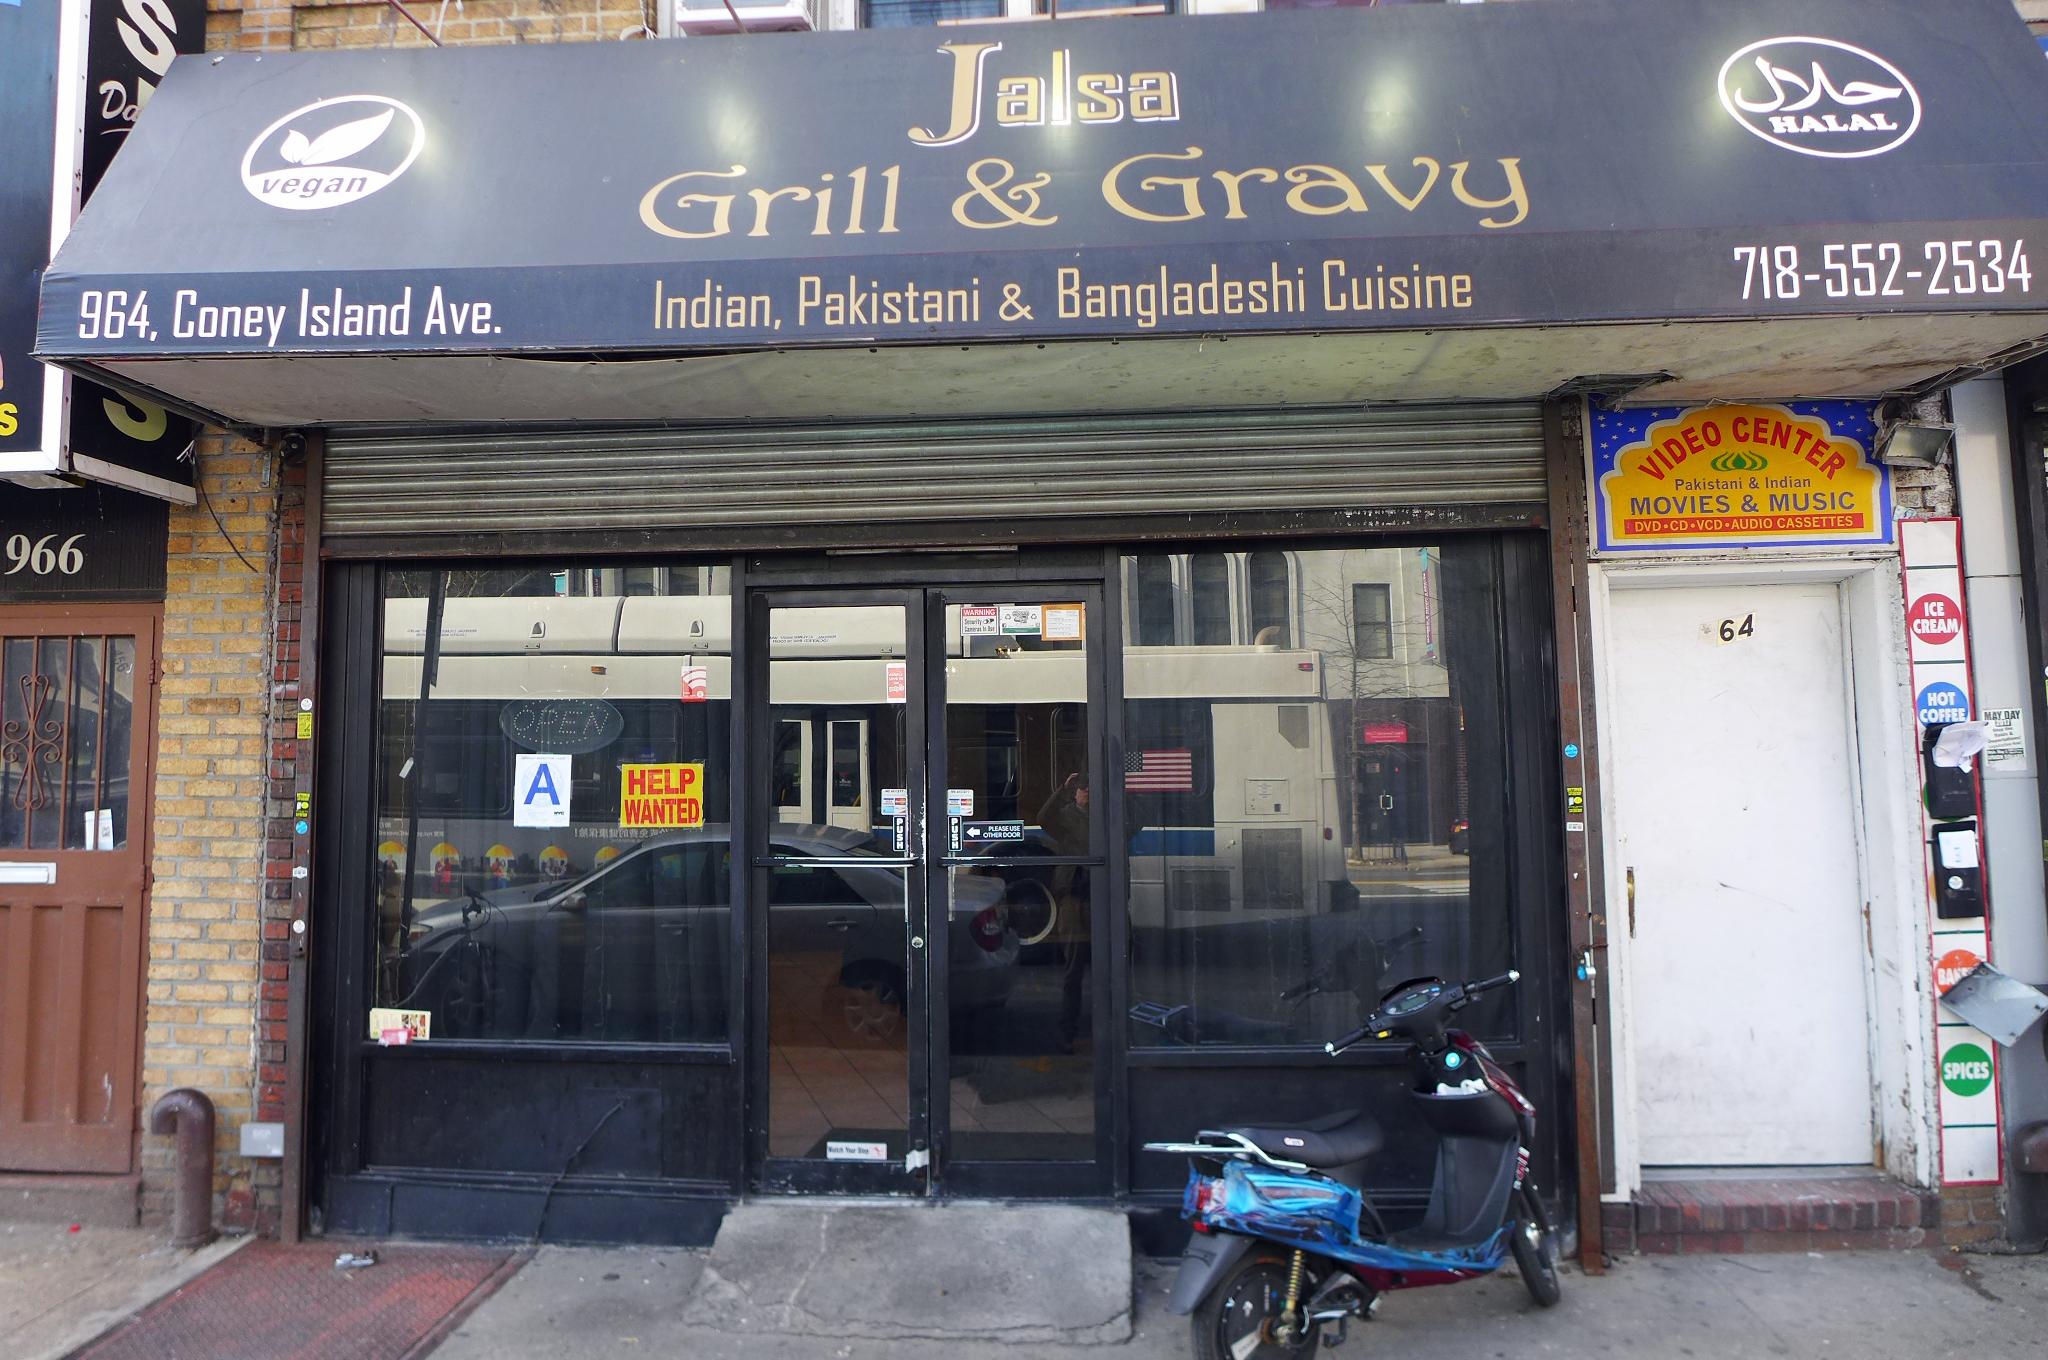 Jalsa Grill & Gravy is located on restaurant-thronged Coney Island Avenue.